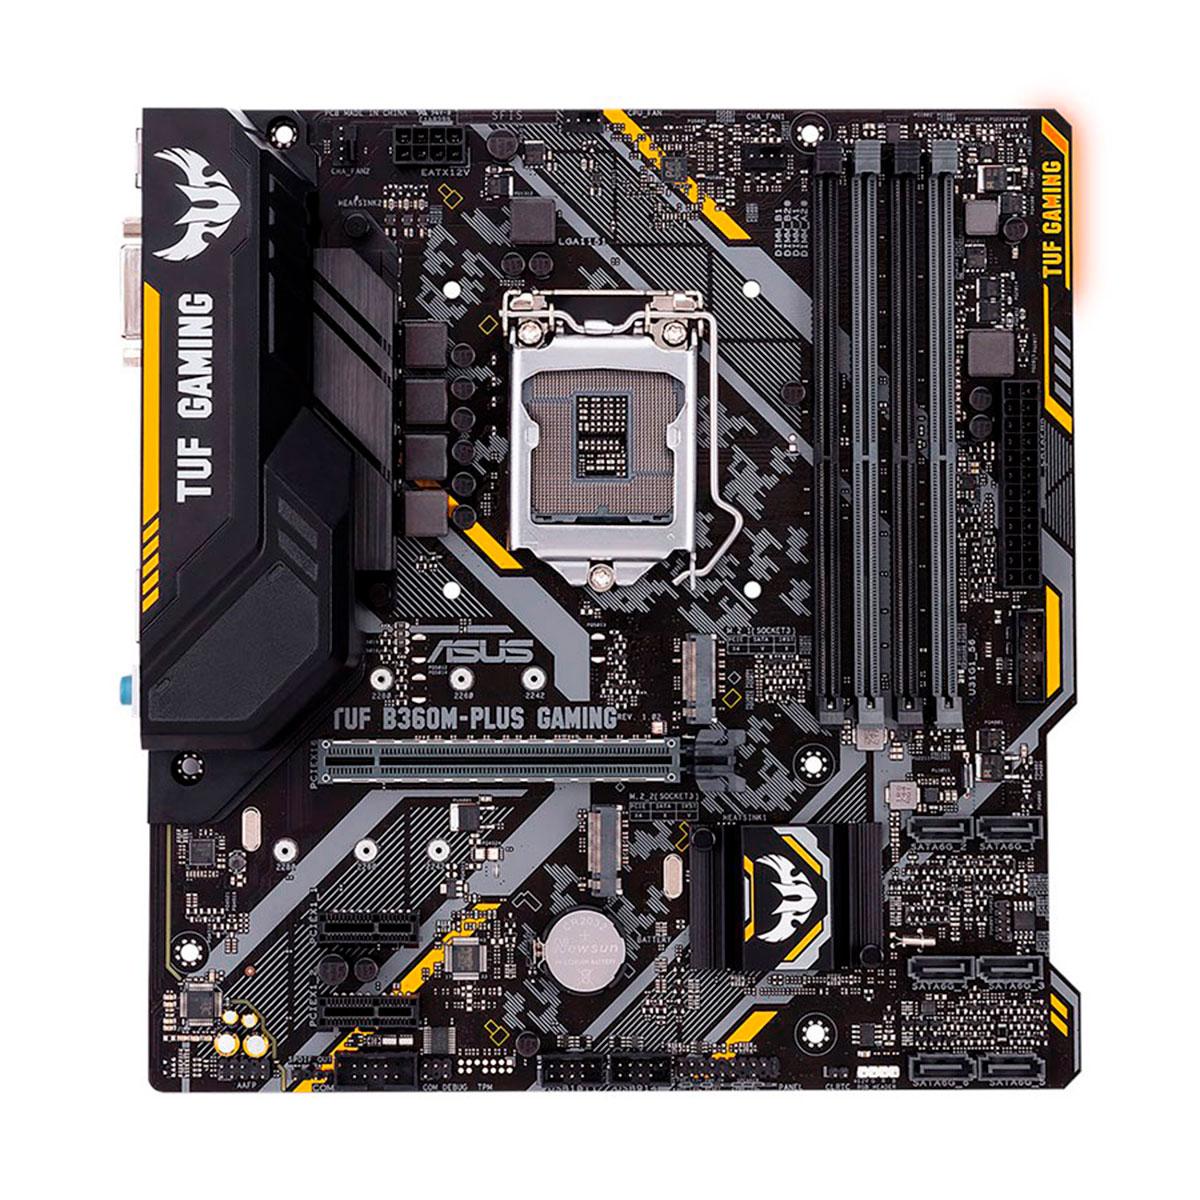 Placa Mãe Asus TUF B360M-PLUS GAMING/BR, Intel 9ª / 8ª Geração, 4 Slots DDR4, LGA1151